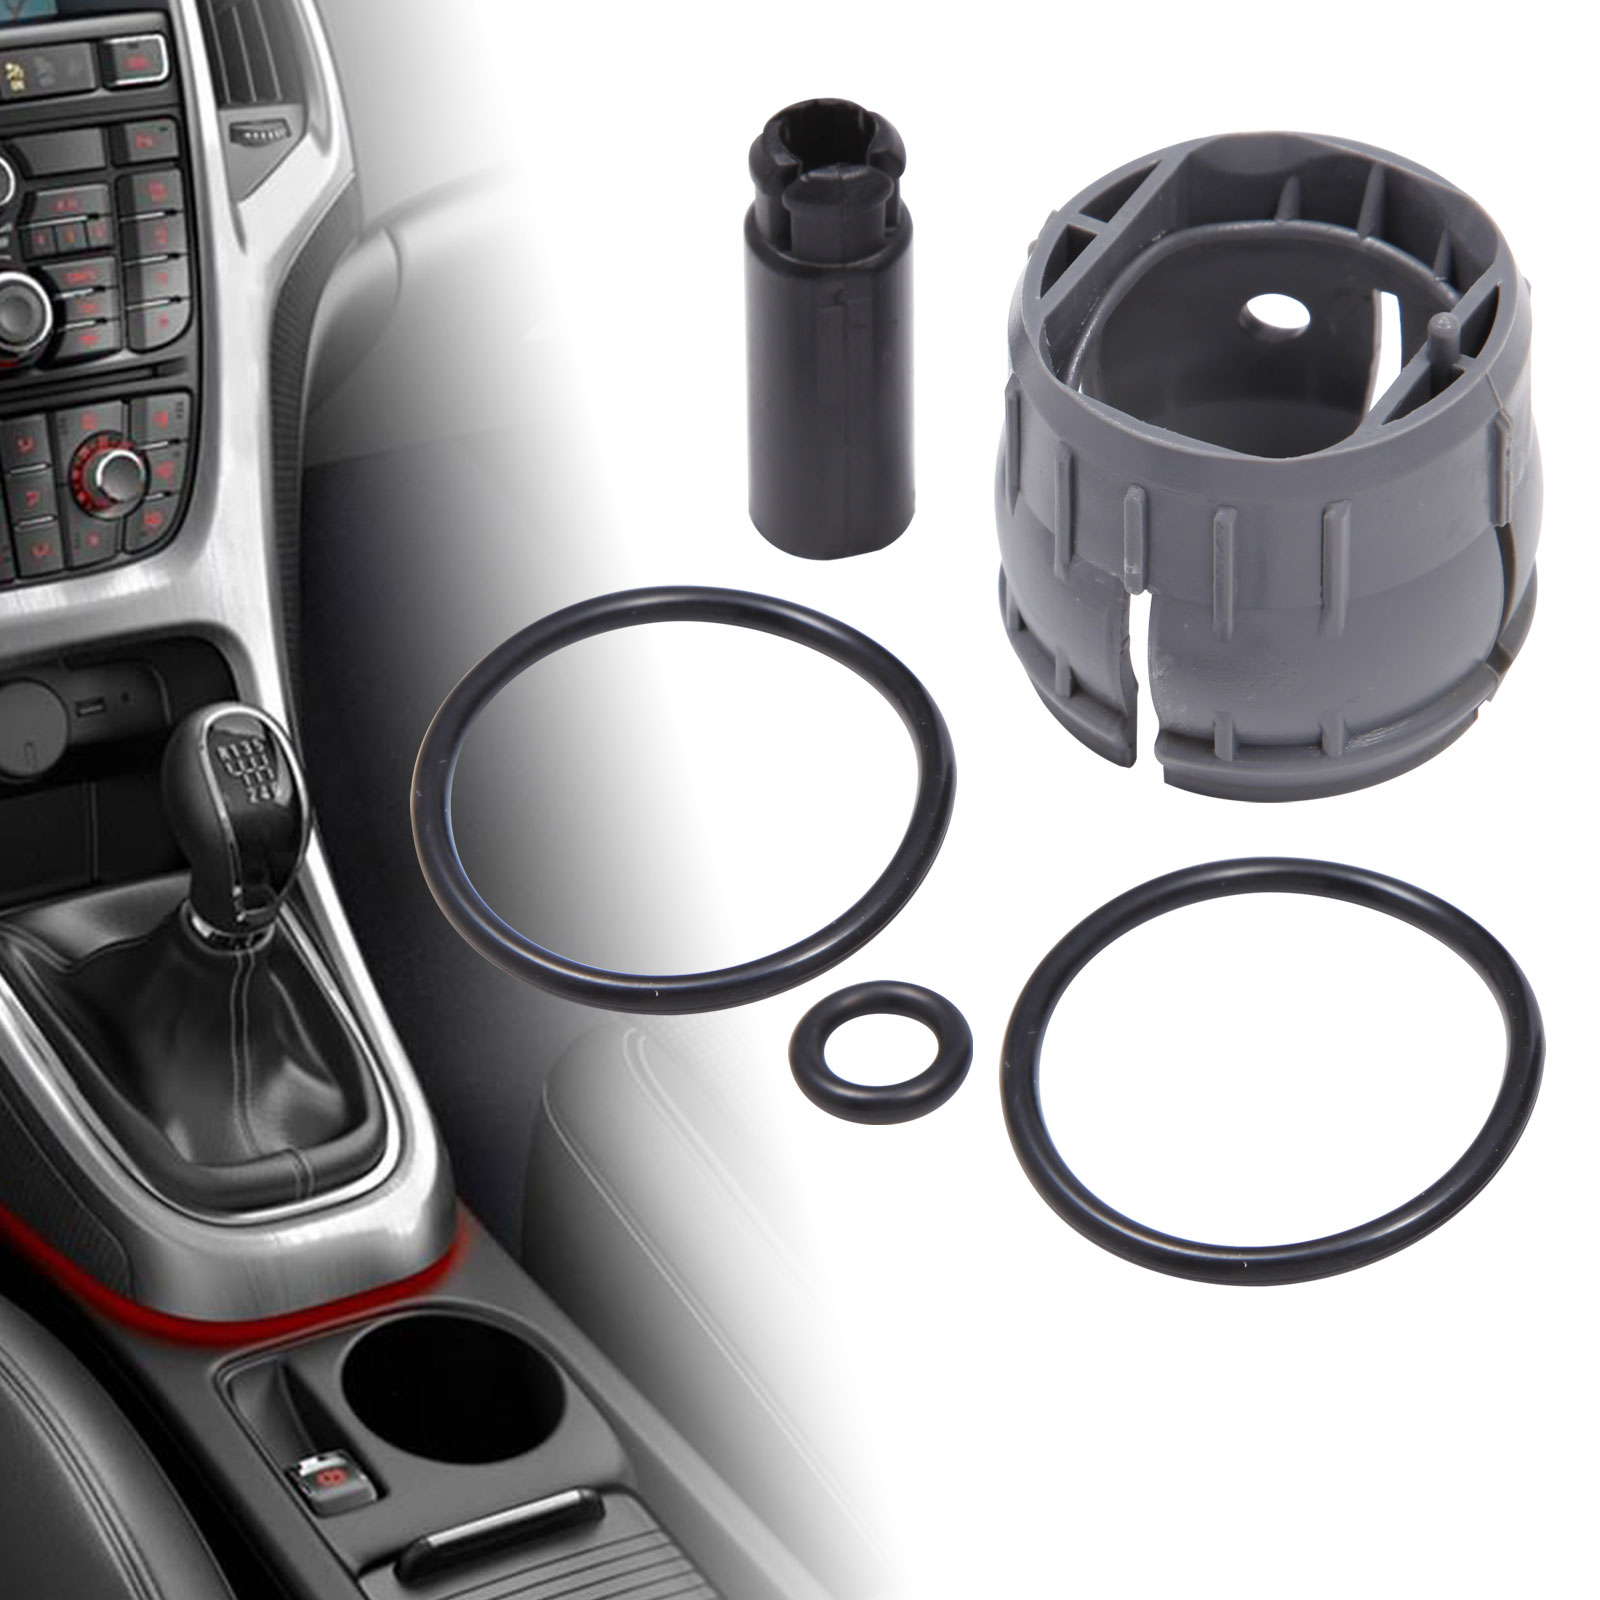 Para Vauxhall Astra F23 Combo palanca de cambios Selector de cambio Reparación